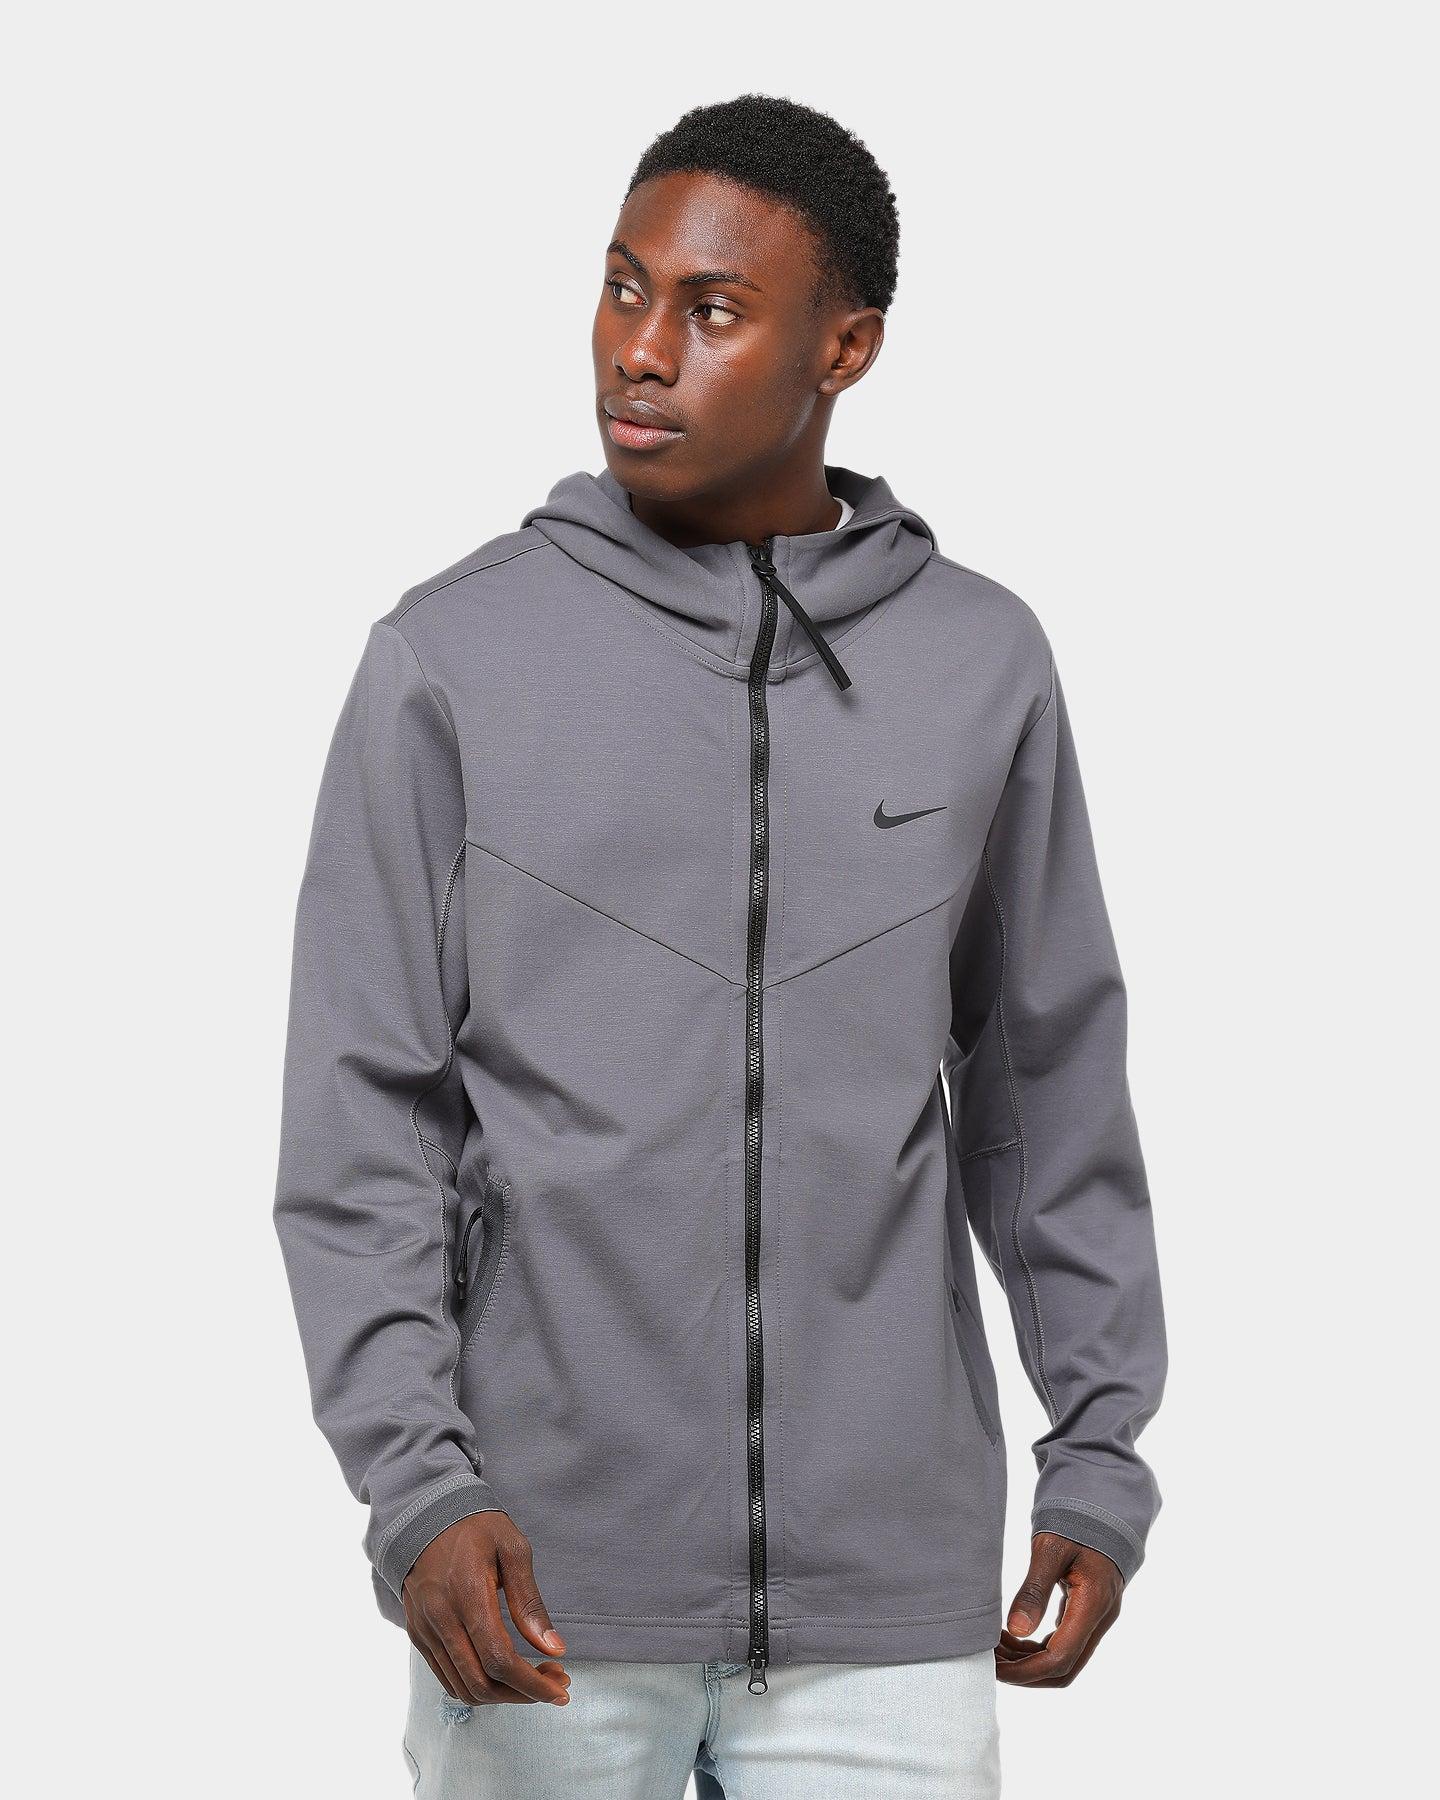 Details about Nike Blacklight Windrunner Jacket XS Winder Breaker Hoodie Purple Reflective